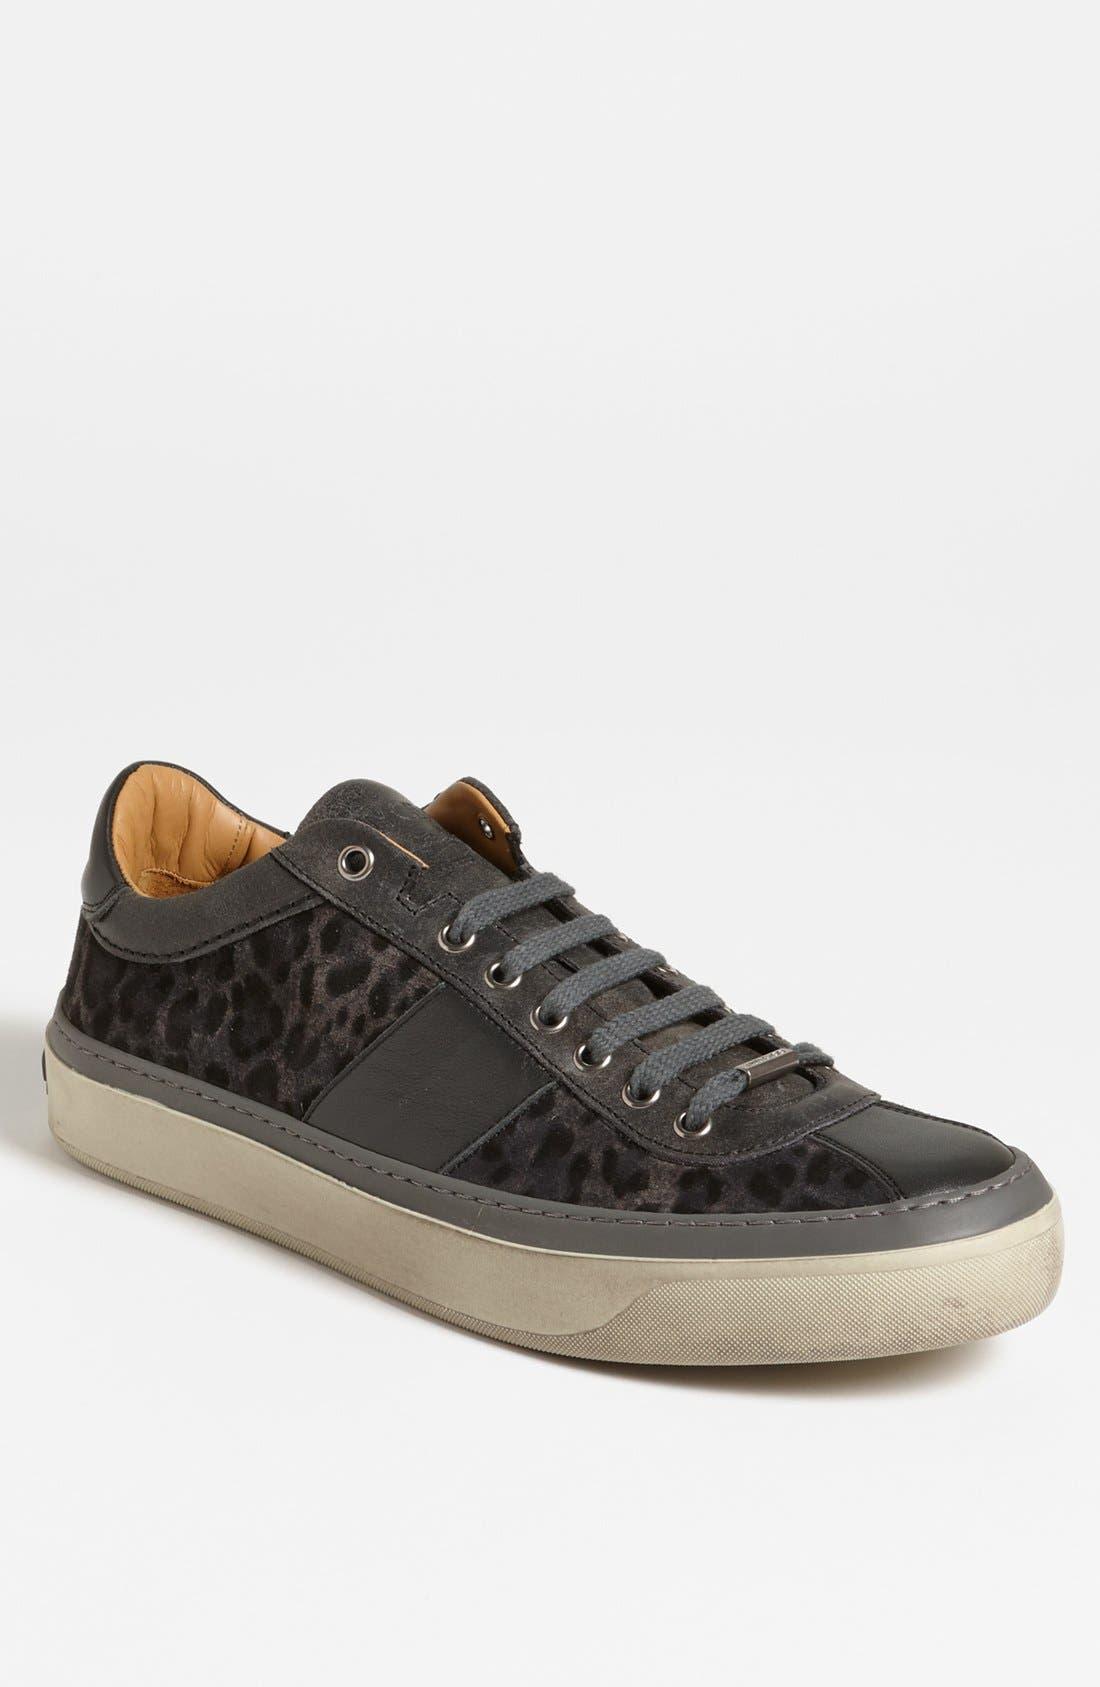 Main Image - Jimmy Choo 'Portman' Sneaker